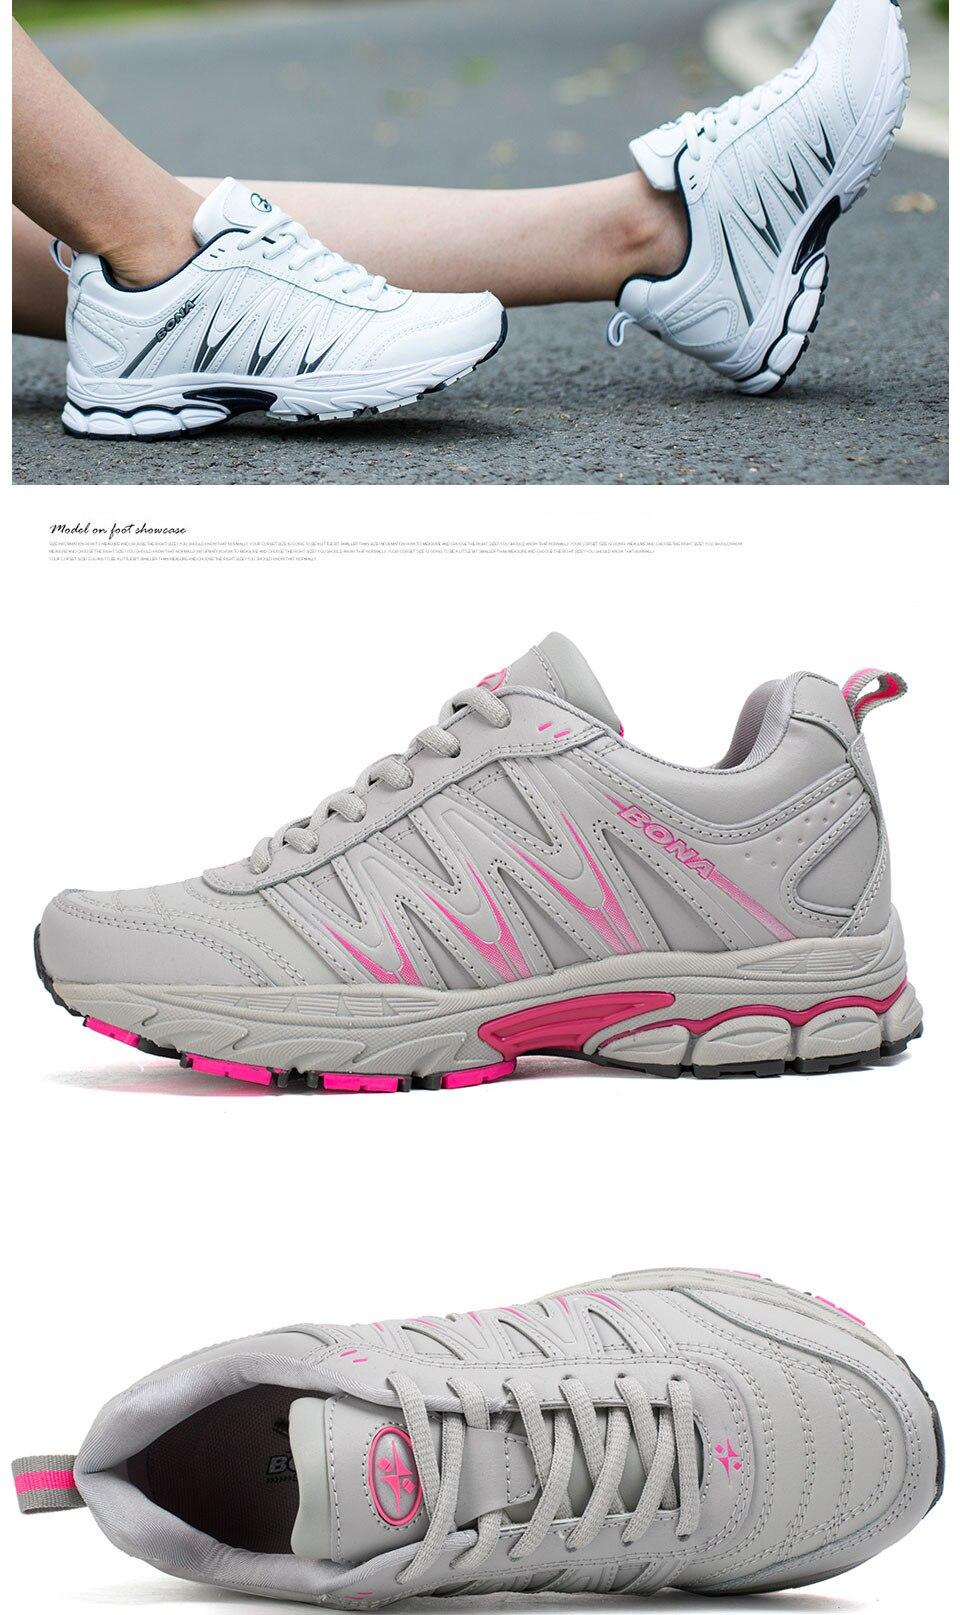 H252f90b7e3ef4eeb910b31b2644ce4355 BONA 2019 New Designers Casual Shoes Men Style Cow Split Sneakers Male Lightweight Outdoor Fashion Footwear Man Trendy Comfy